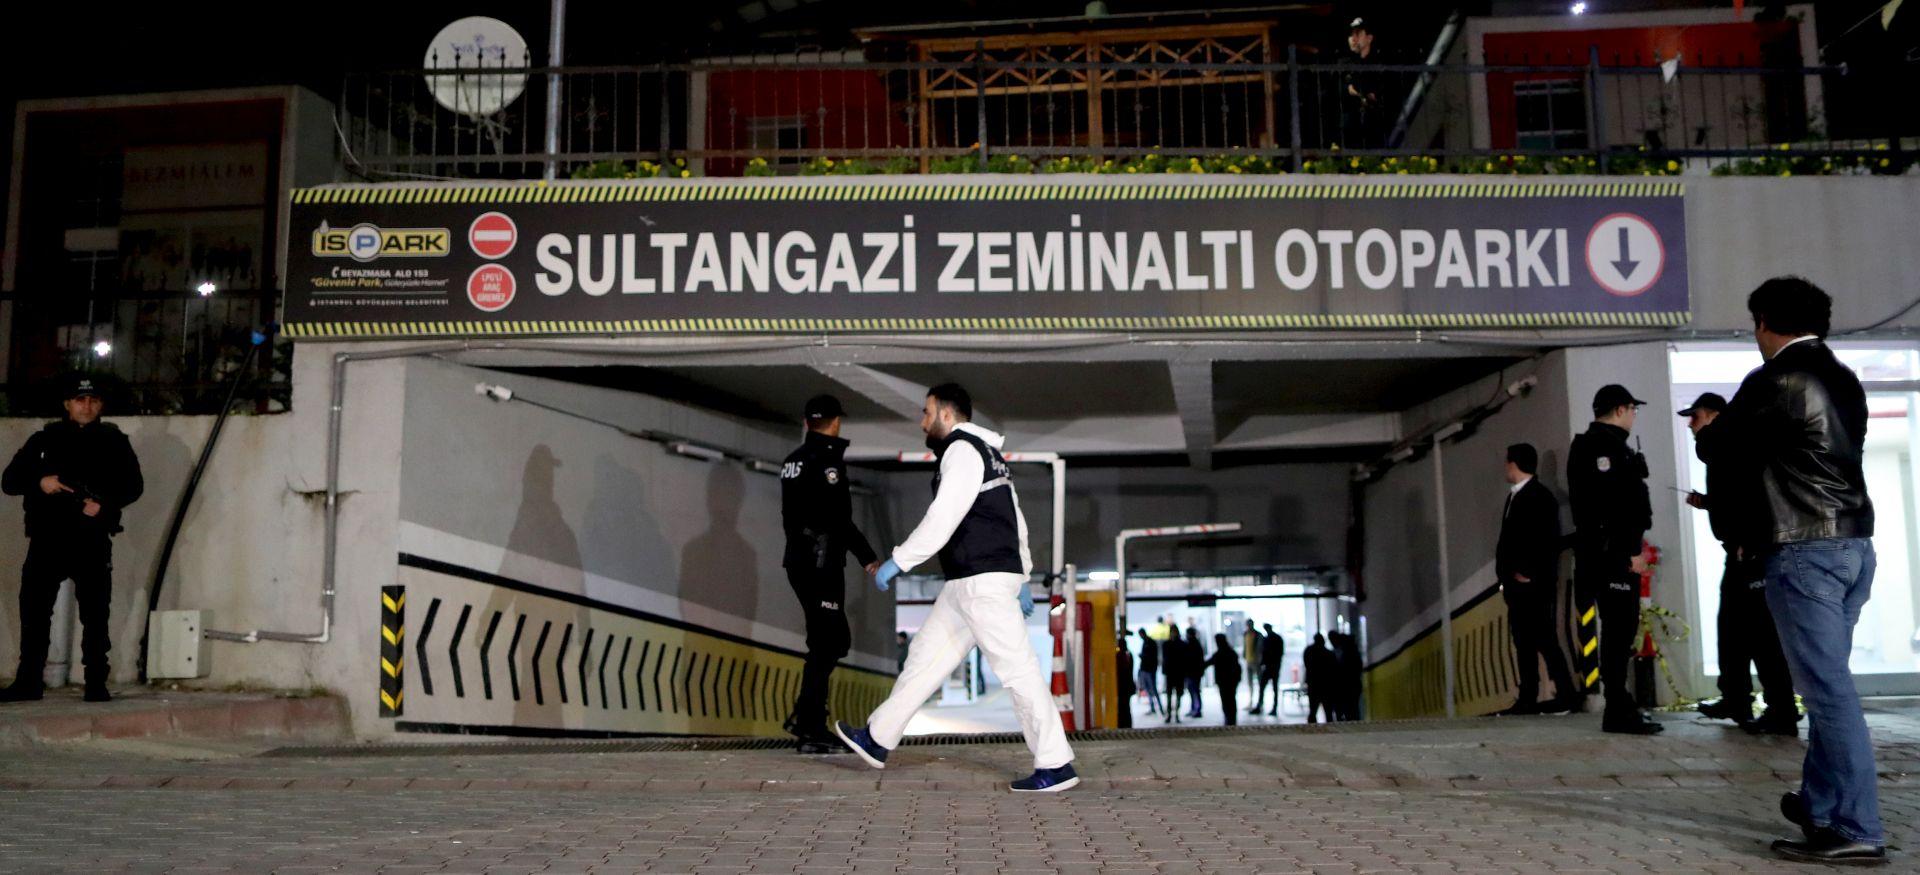 "TURSKA ISTRAGA ""Naredba odozgo za Khashoggija"""